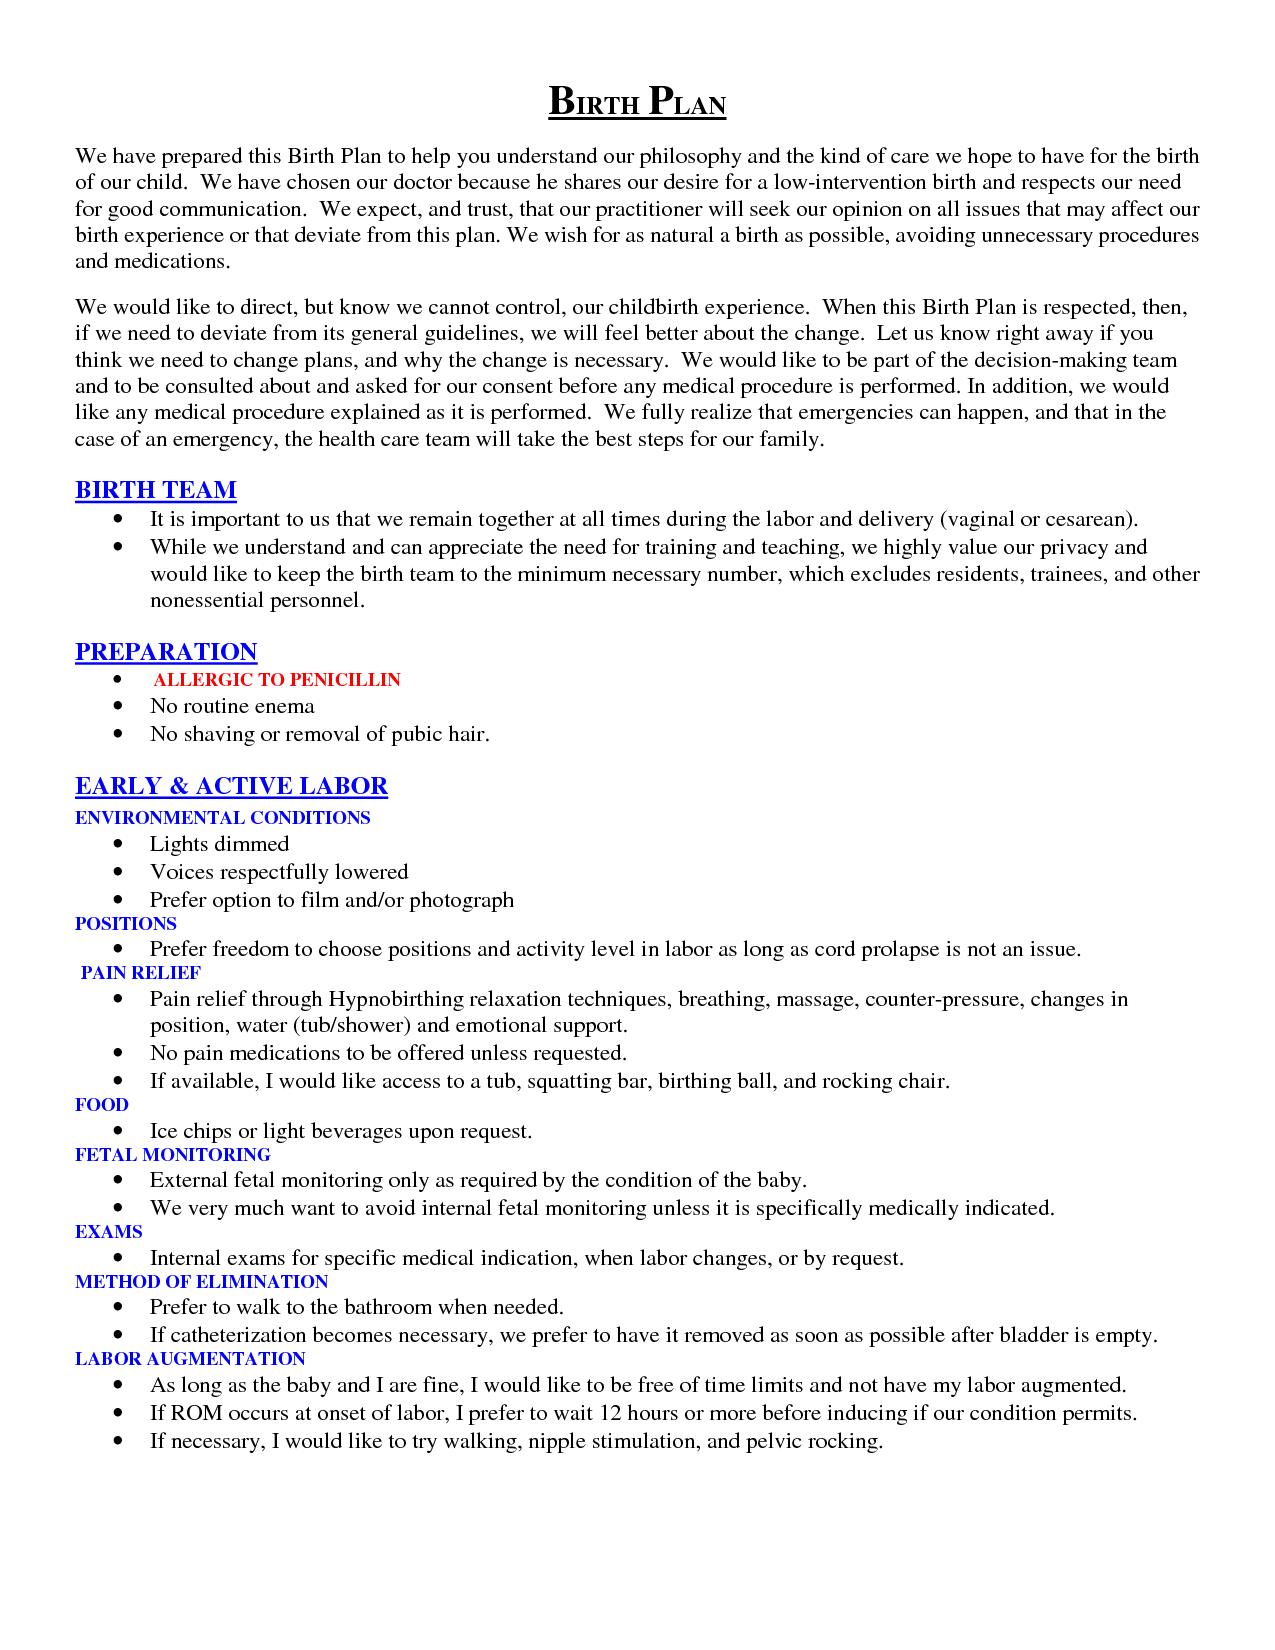 scope of work template Birth plan, Birth plan template